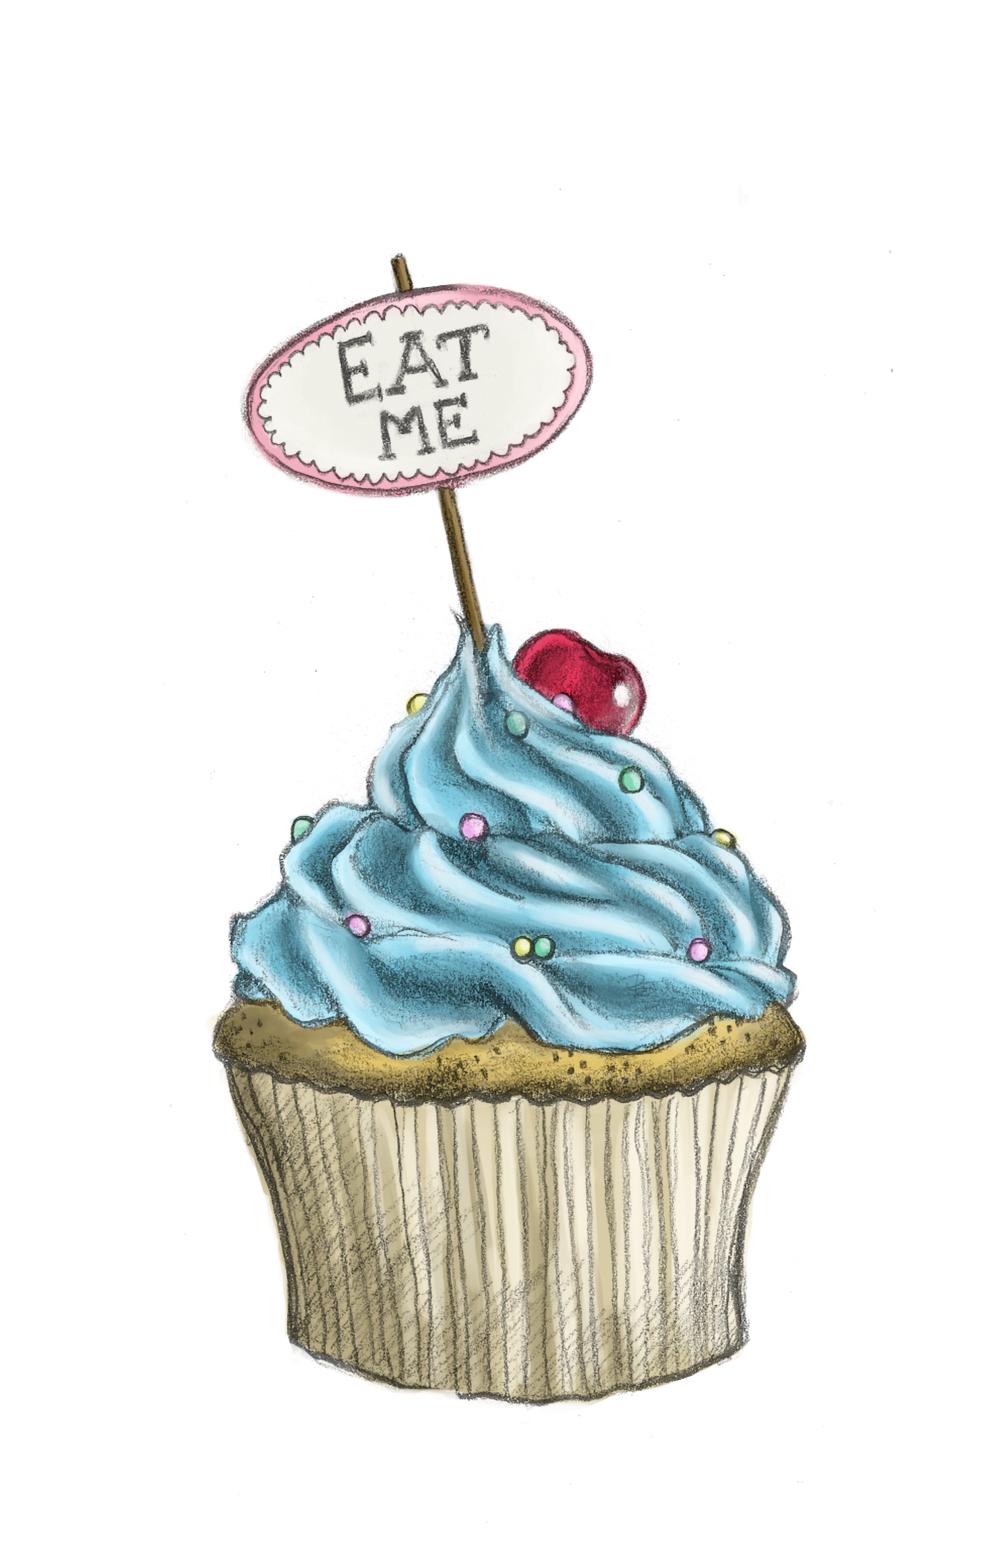 Drawn cupcake cake art For > dibujos eskulanak con